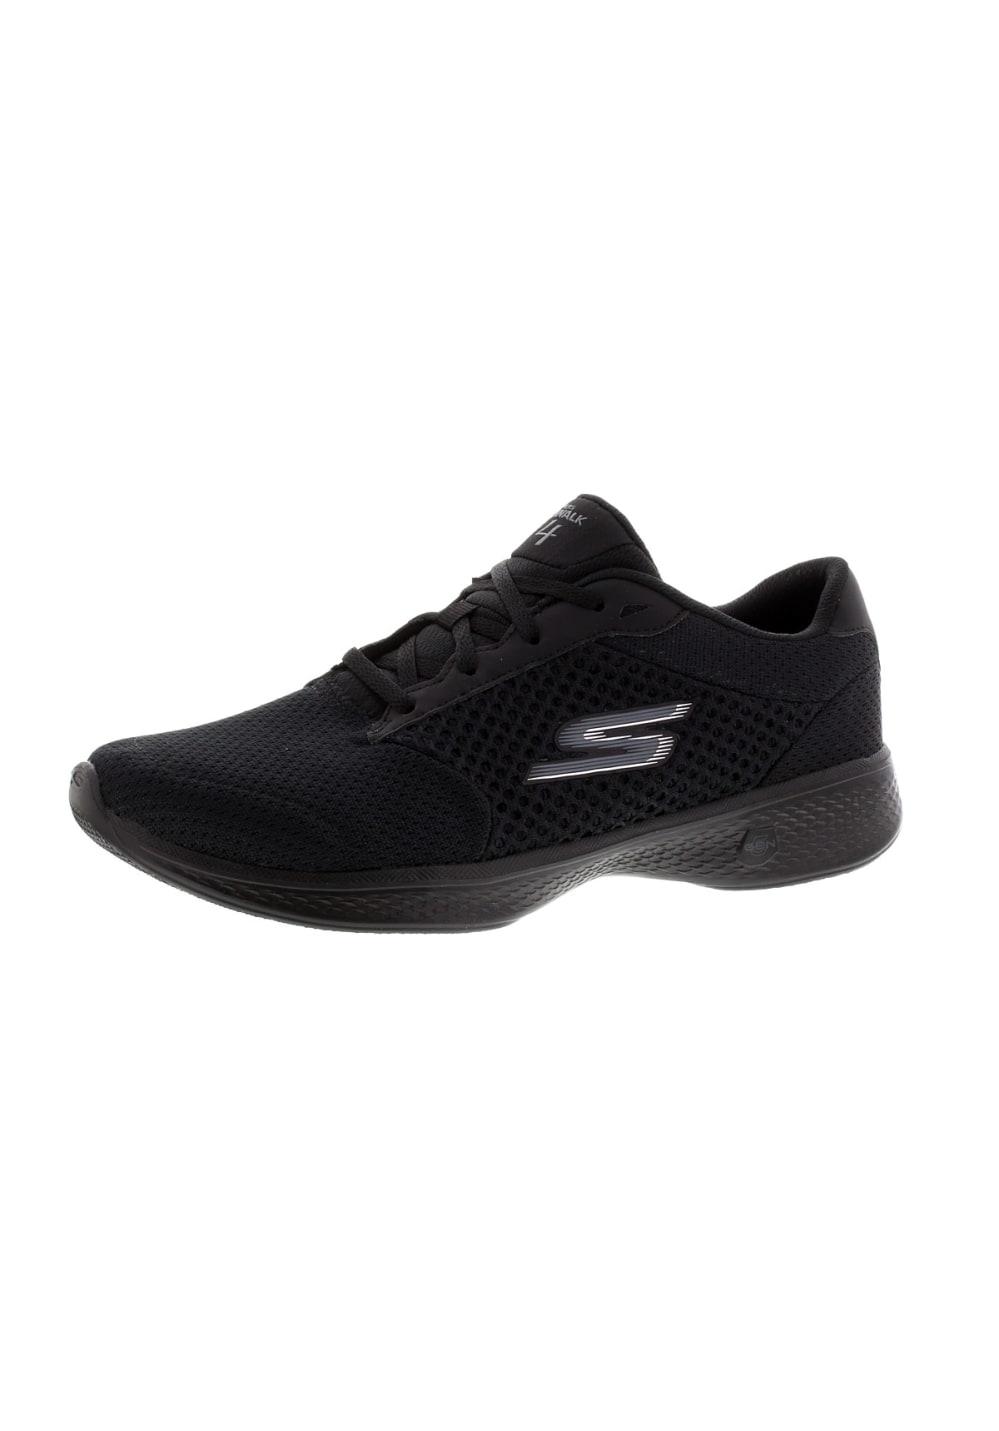 Skechers Gowalk 4-Exceed, Zapatillas Mujer, Gris (Gry), 36 EU